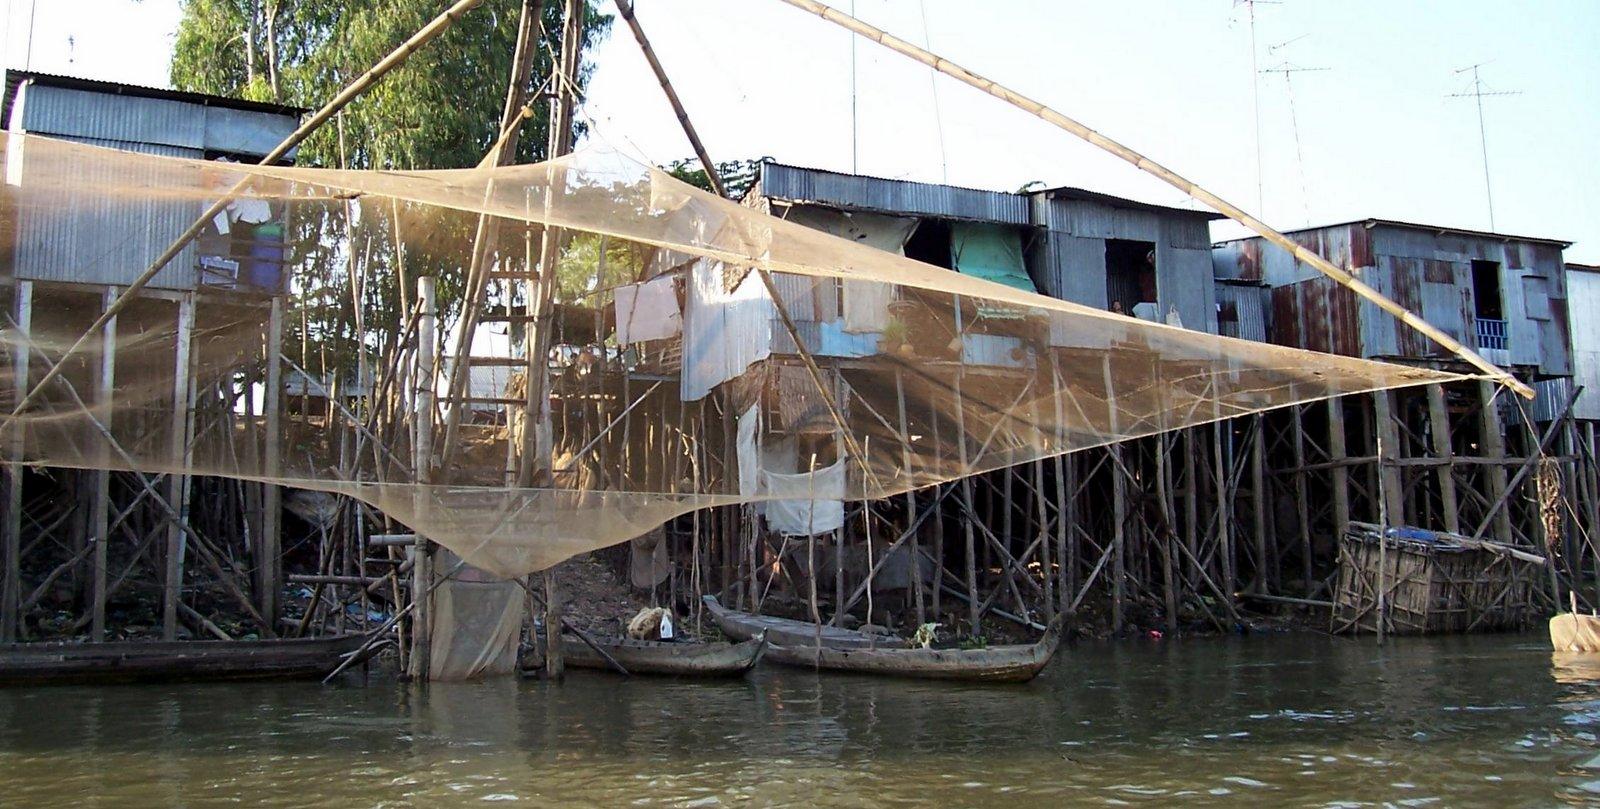 Pfahlbauten in Chau Doc - Vietnam